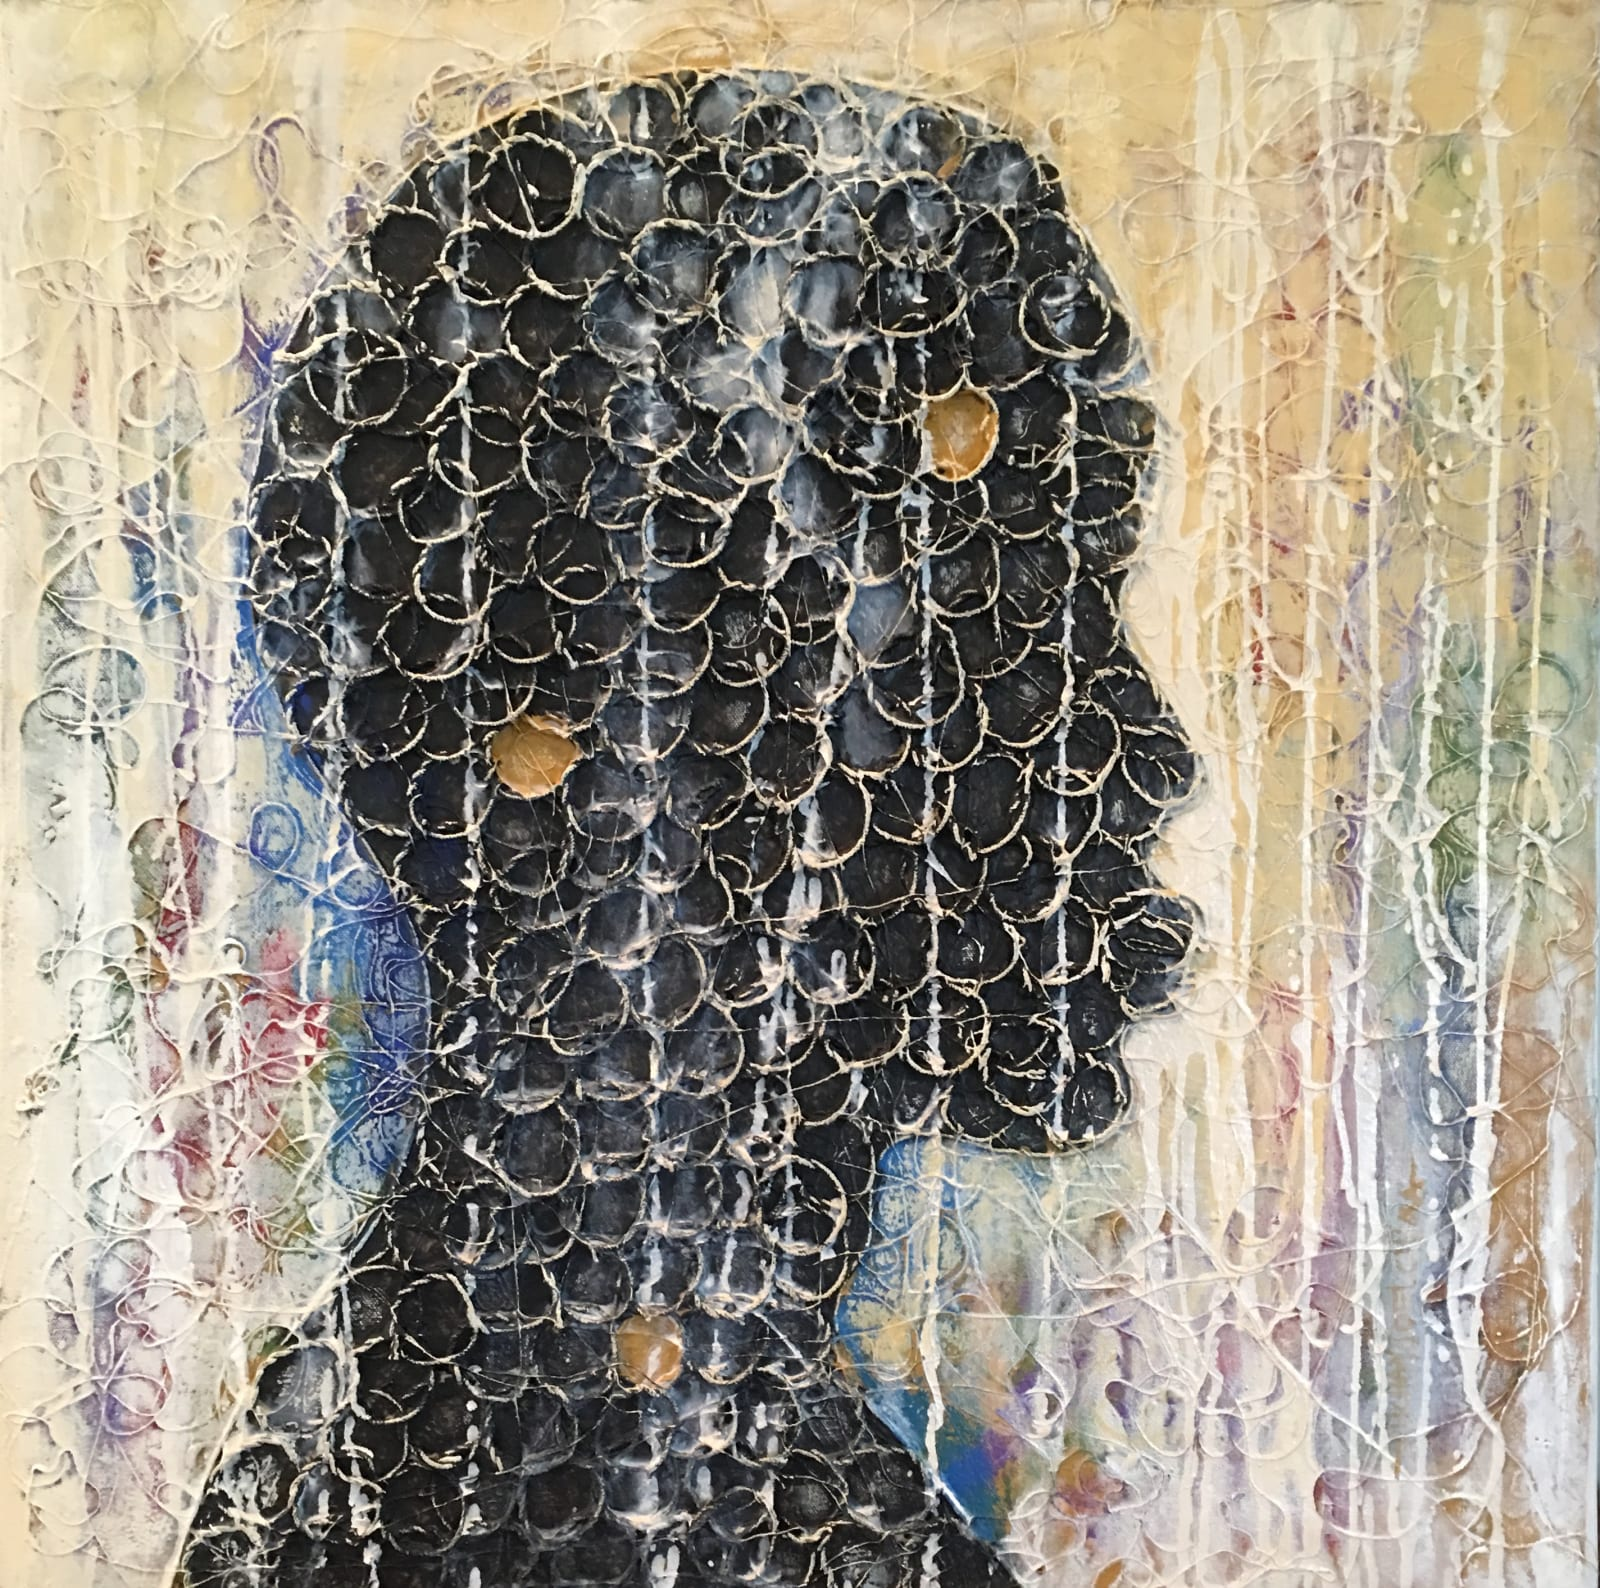 Uchay Chima, Visionary viii, 2018